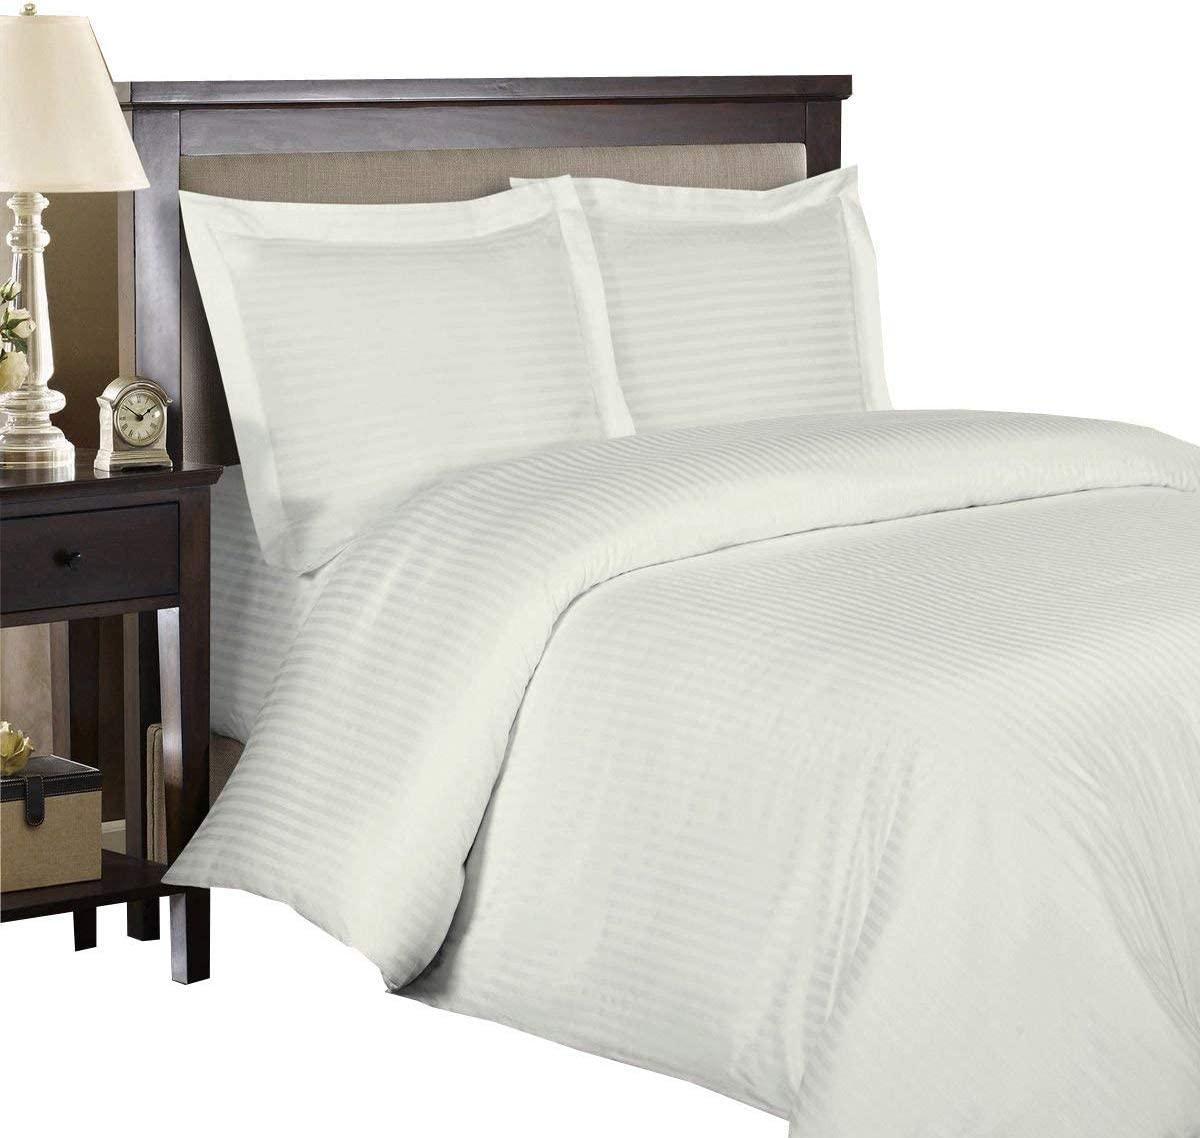 Royal Hotel Ultra Soft Duvet Cover Set, 3PC Duvet Set, Wrinkle-Free, Button Closer, Striped Sateen, Duvet Covers - Full/Queen - Ivory